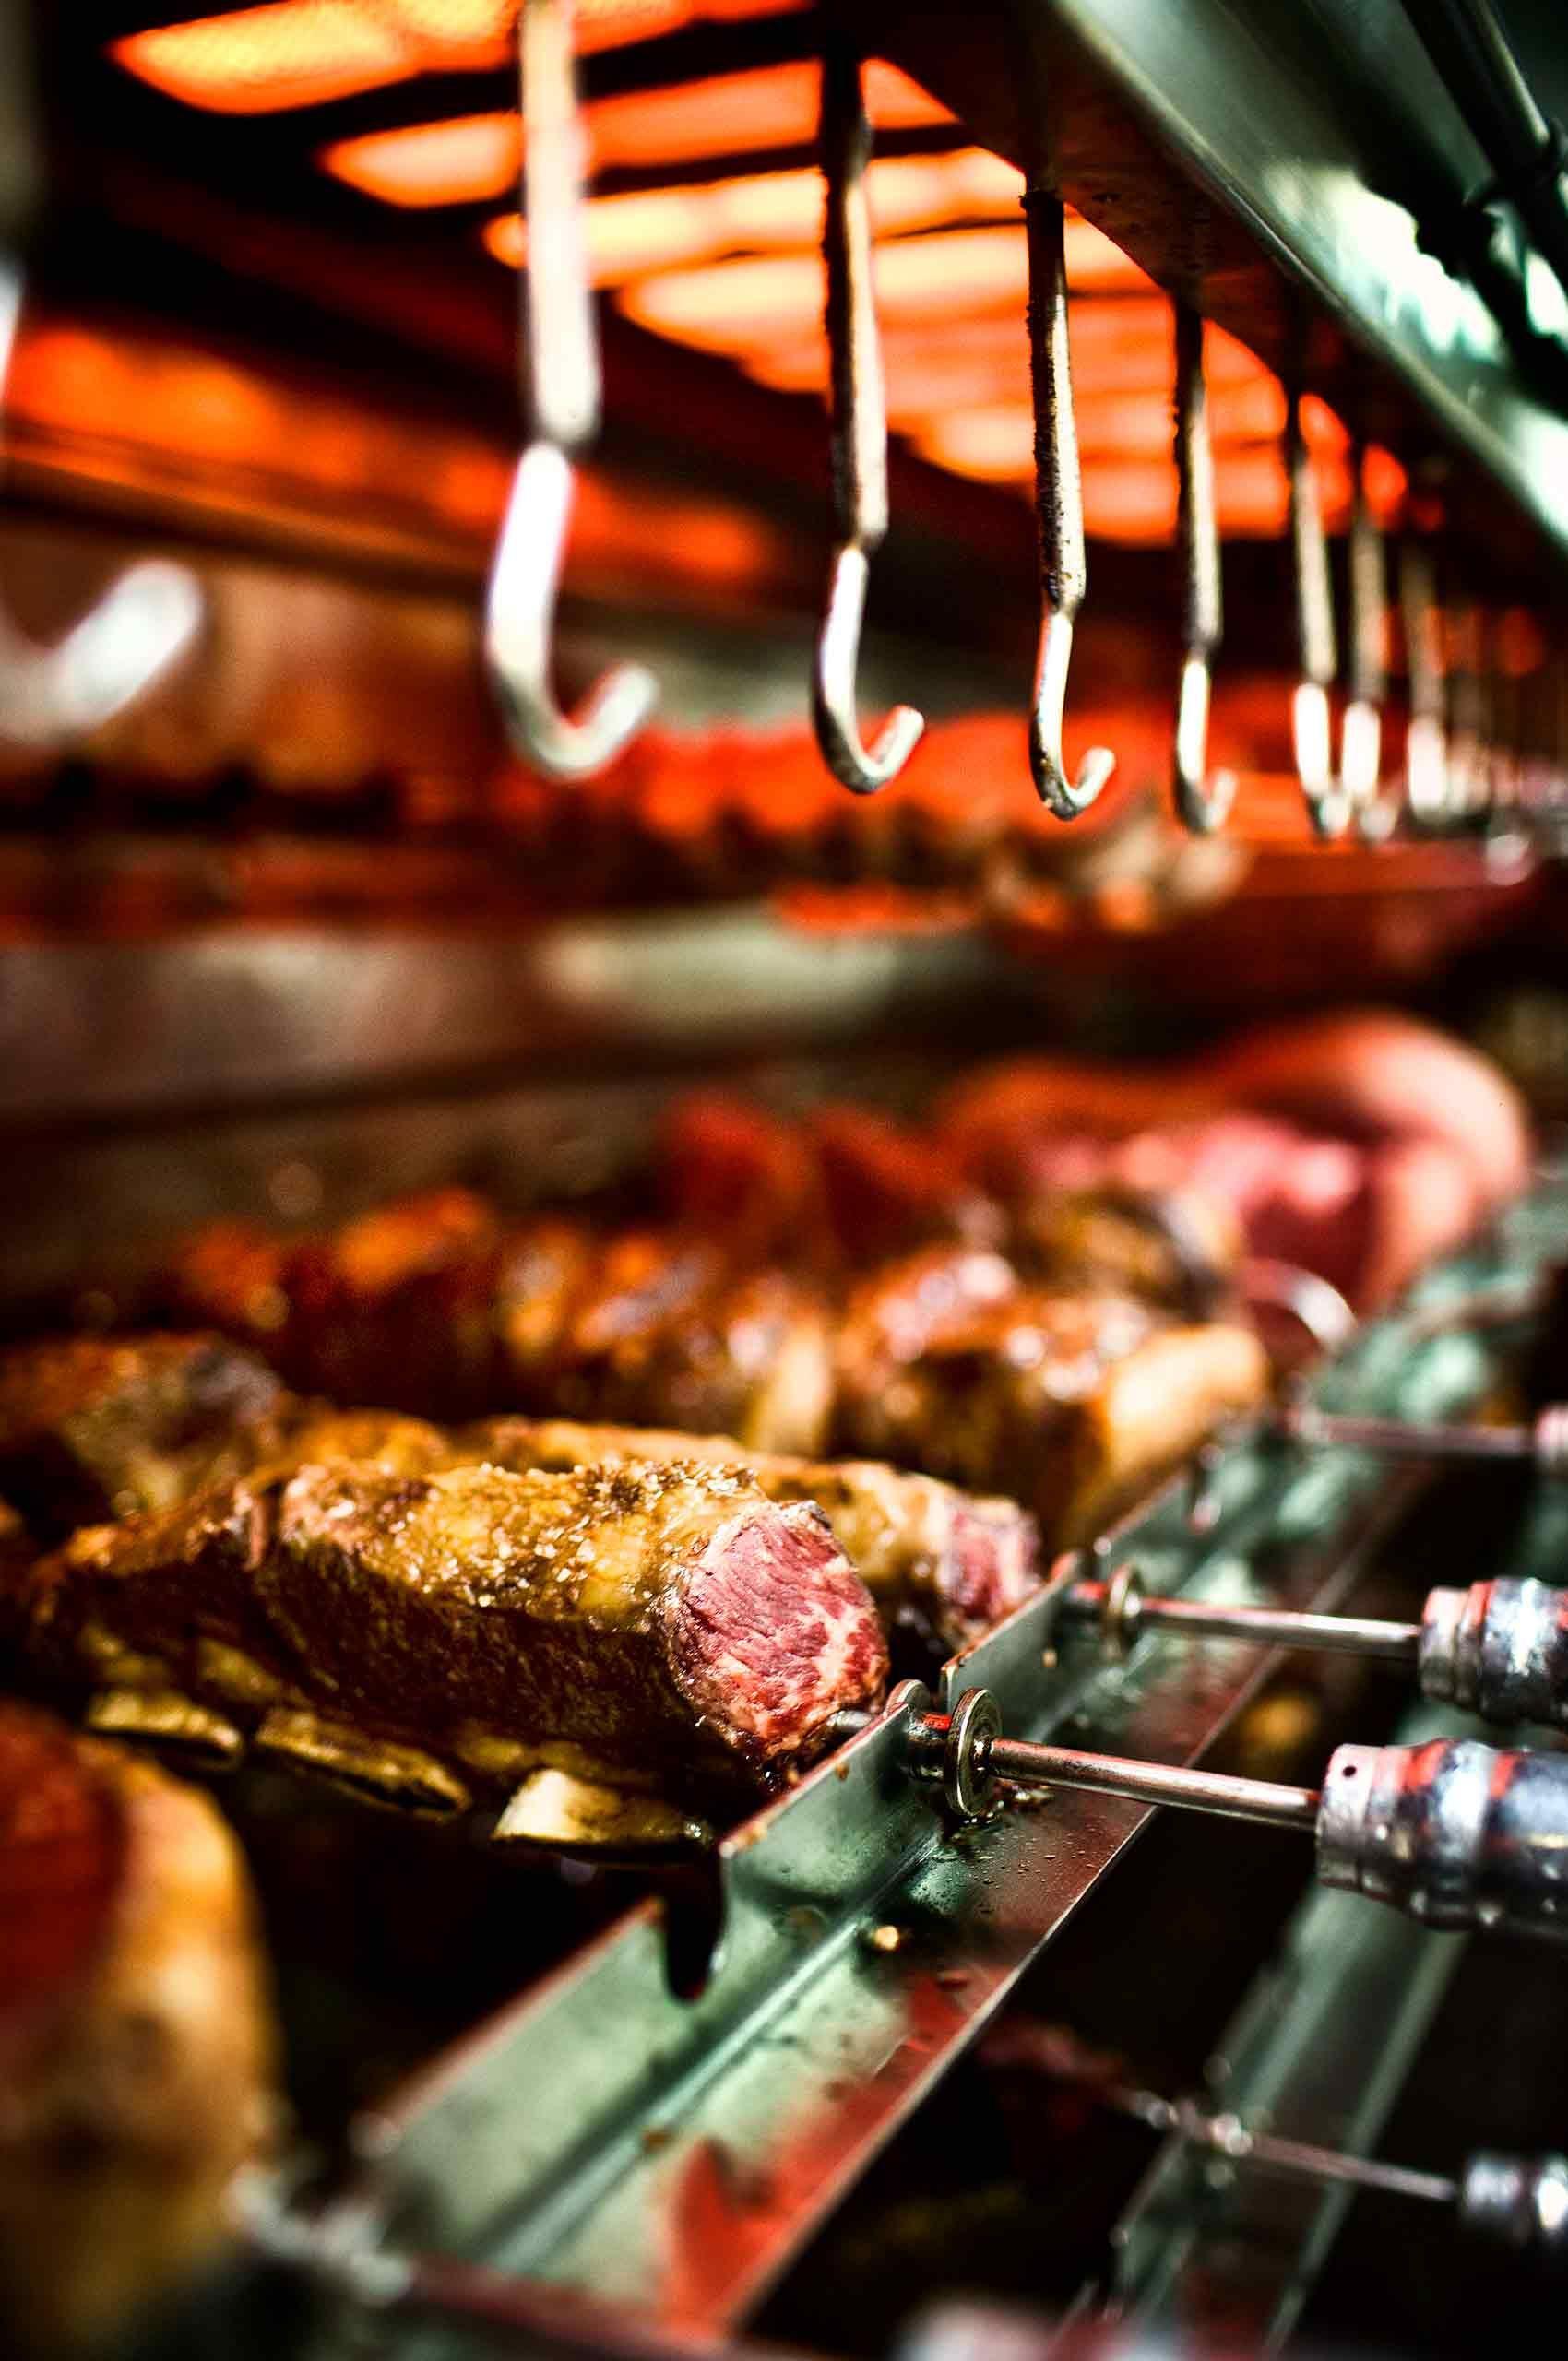 Churrascaria-MeatOnSkewers-Grill-by-HenrikOlundPhotography.jpg